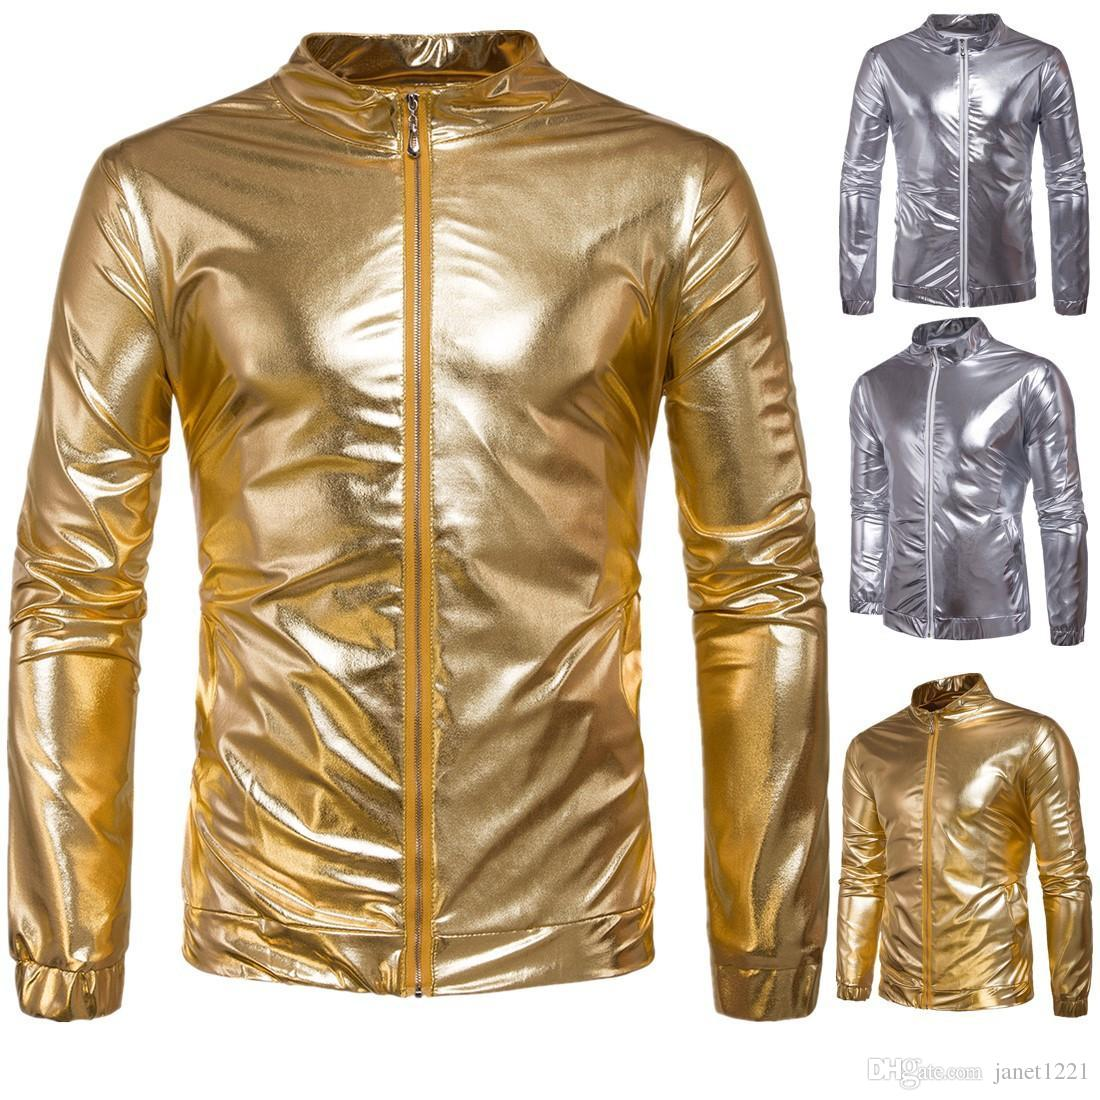 Solid Color Zipper Dance Jackets Harem Women Men Unisex Gold Silver Shiny Jacket Hip Hop Night Club Performance Wear Jacket T170710